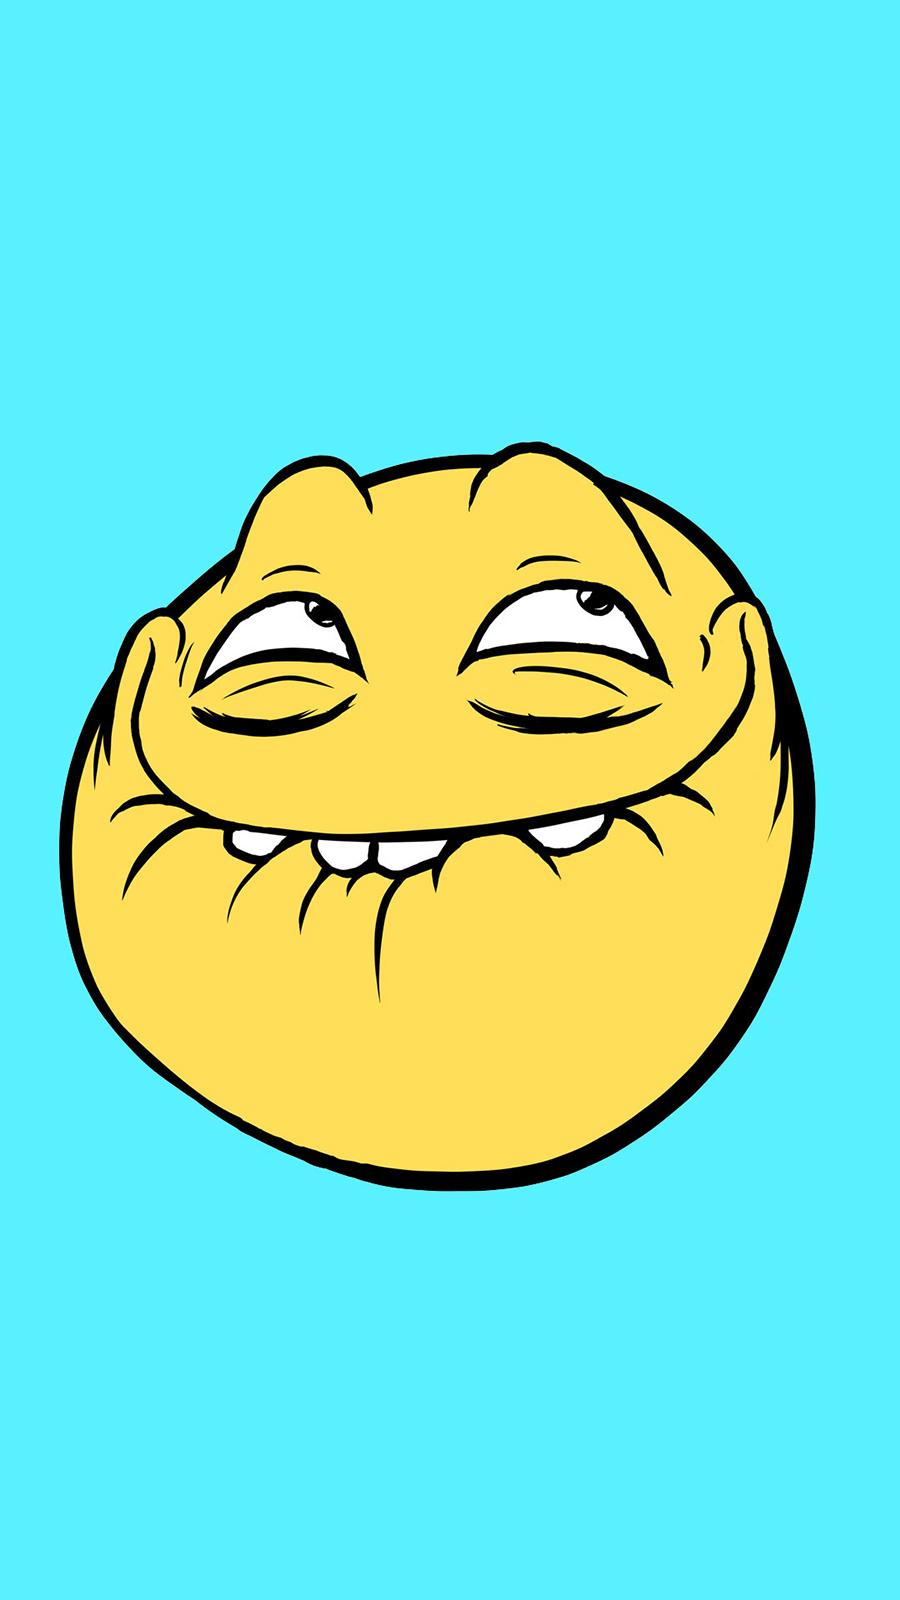 Meme Face Wallpapers Free Download